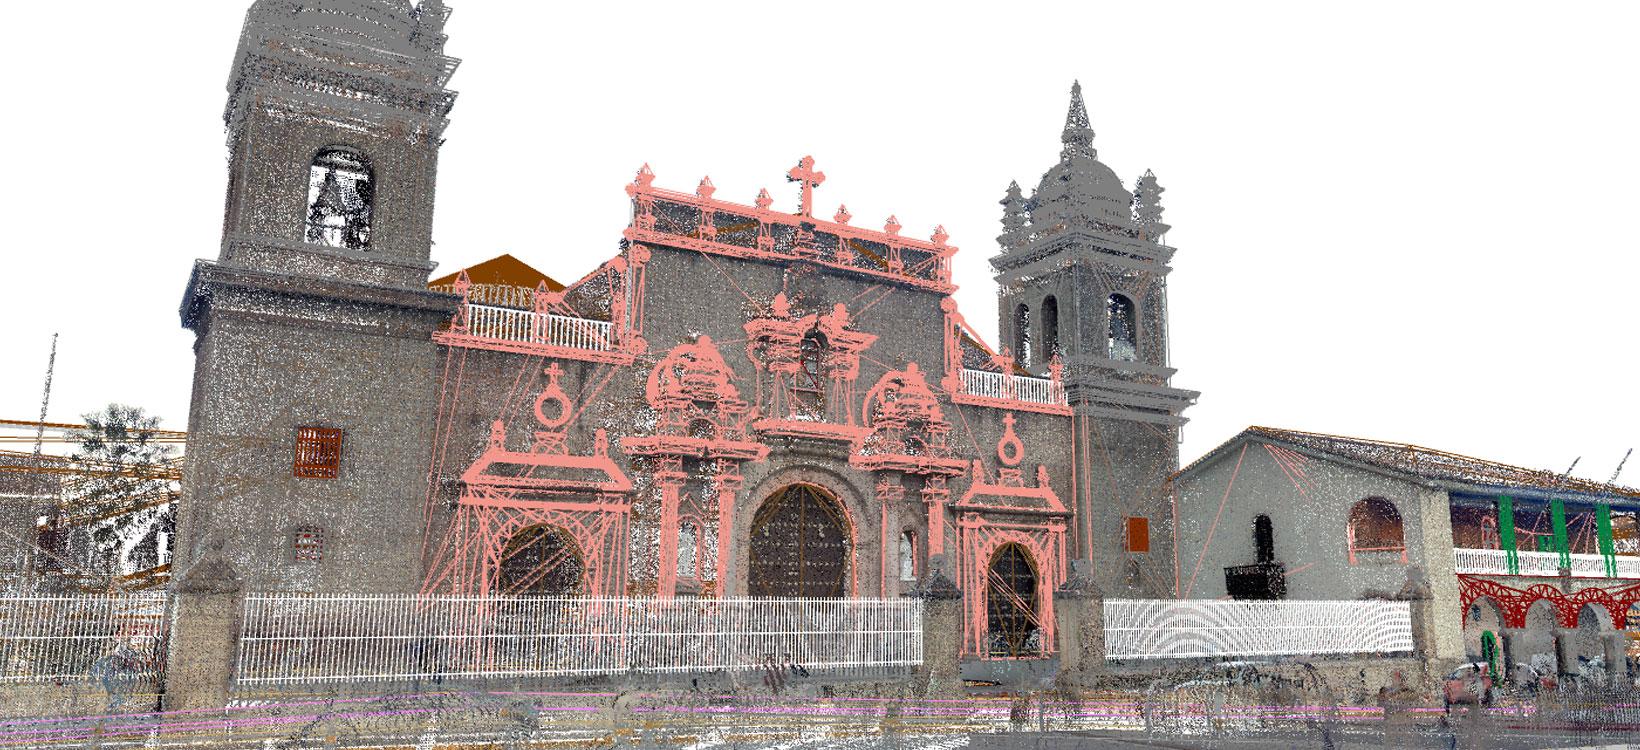 Ayacucho's smart digital city project